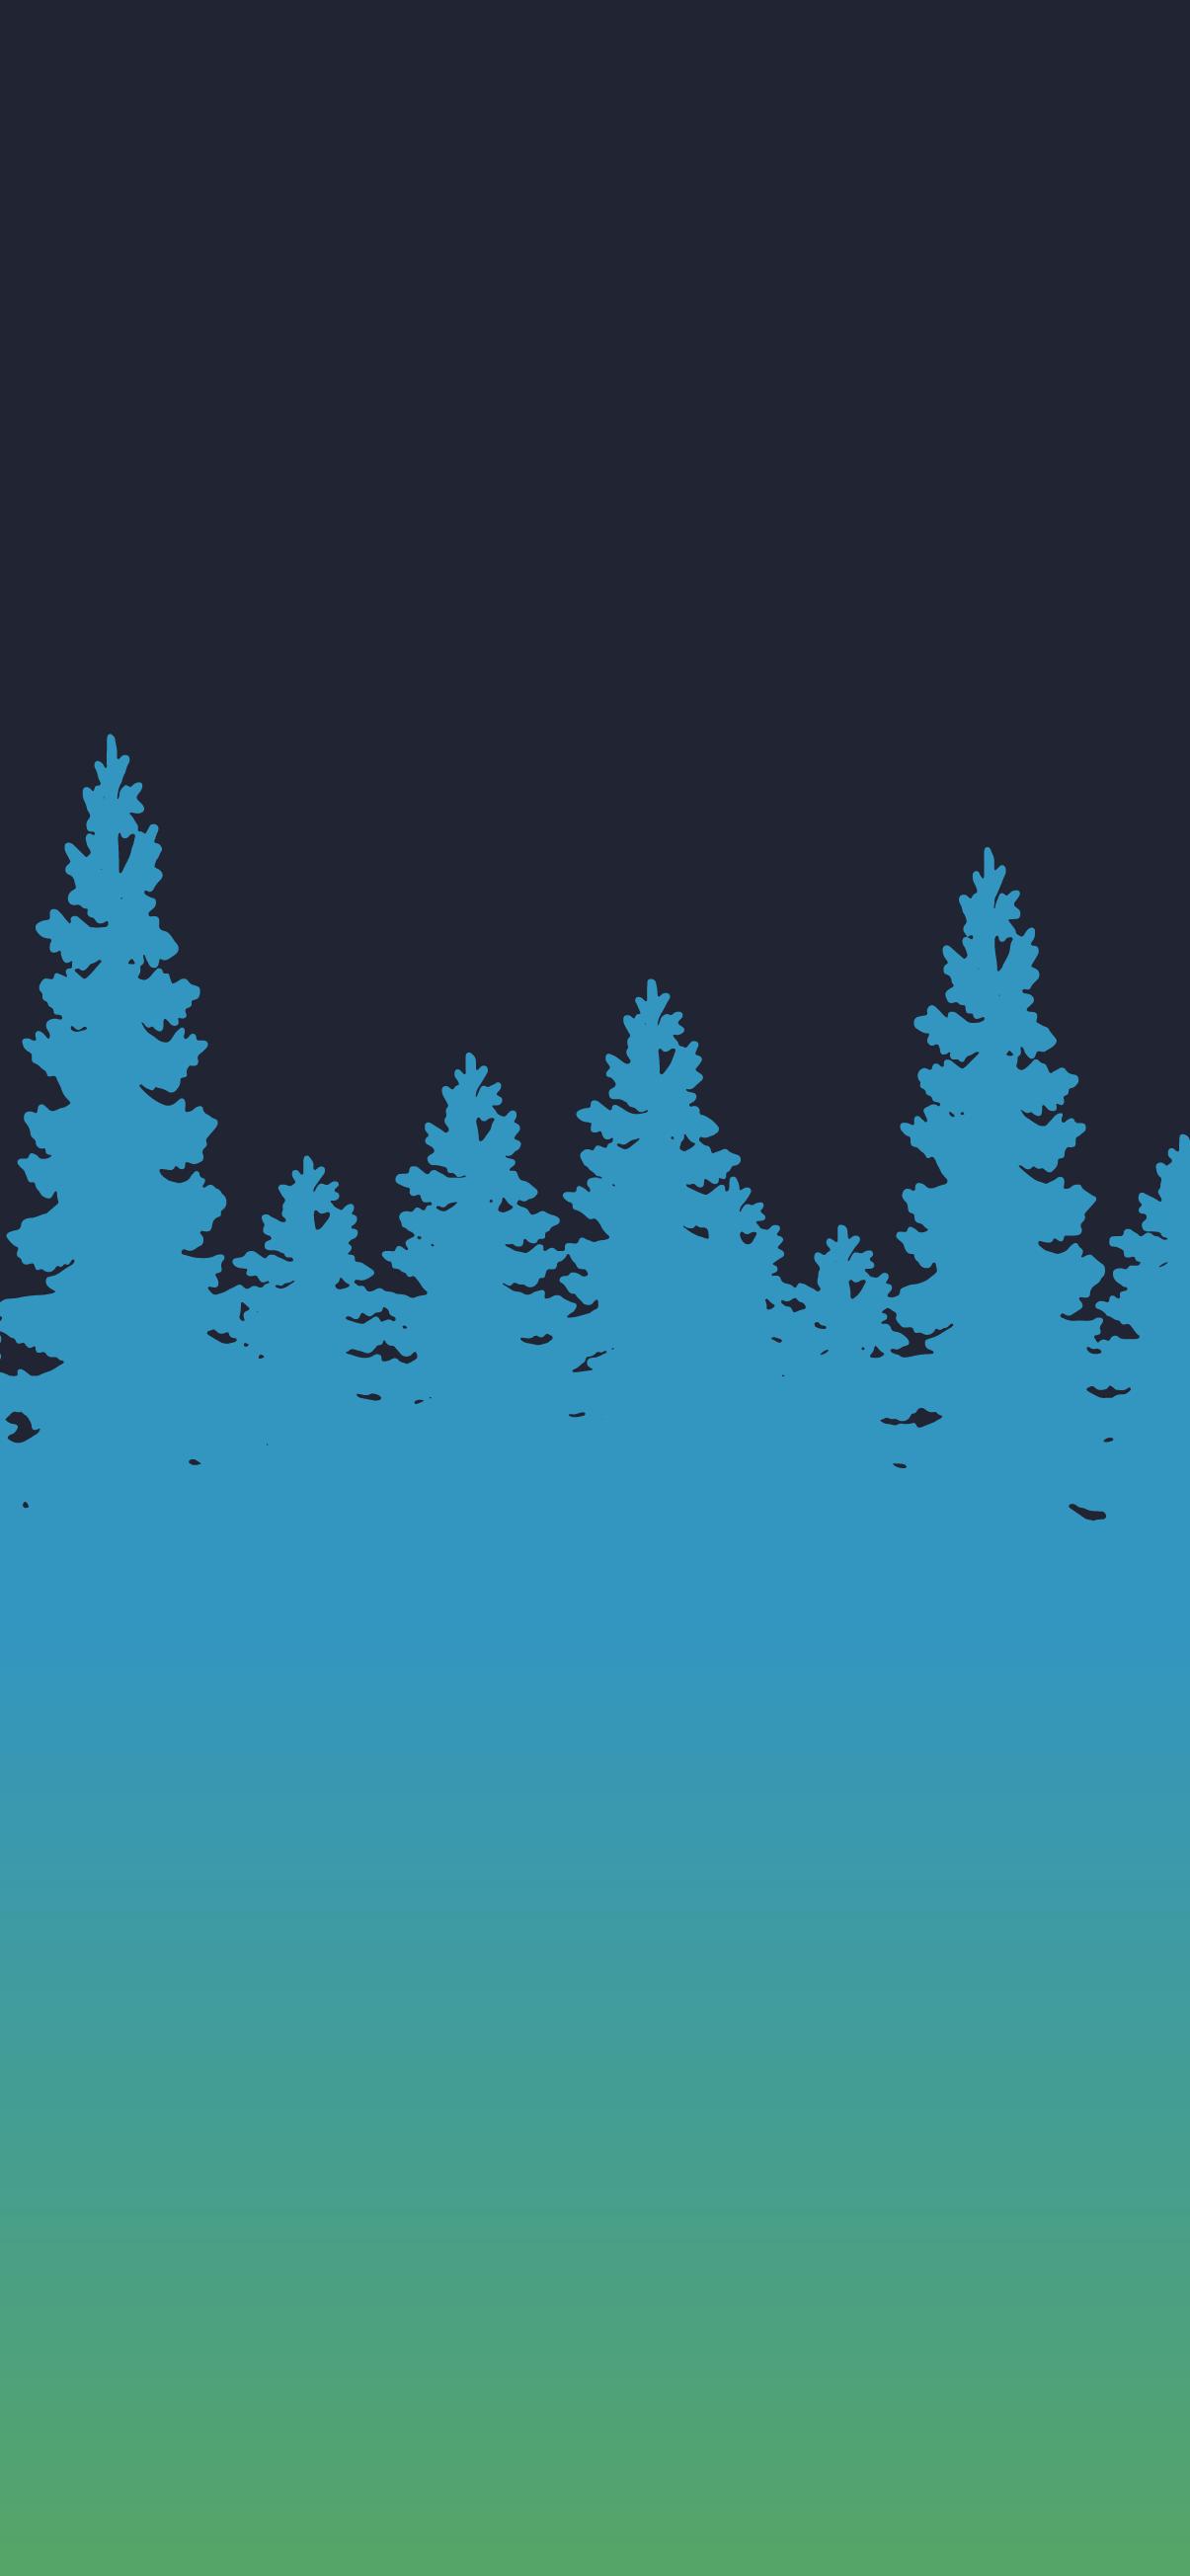 tree silhouette wallpaper